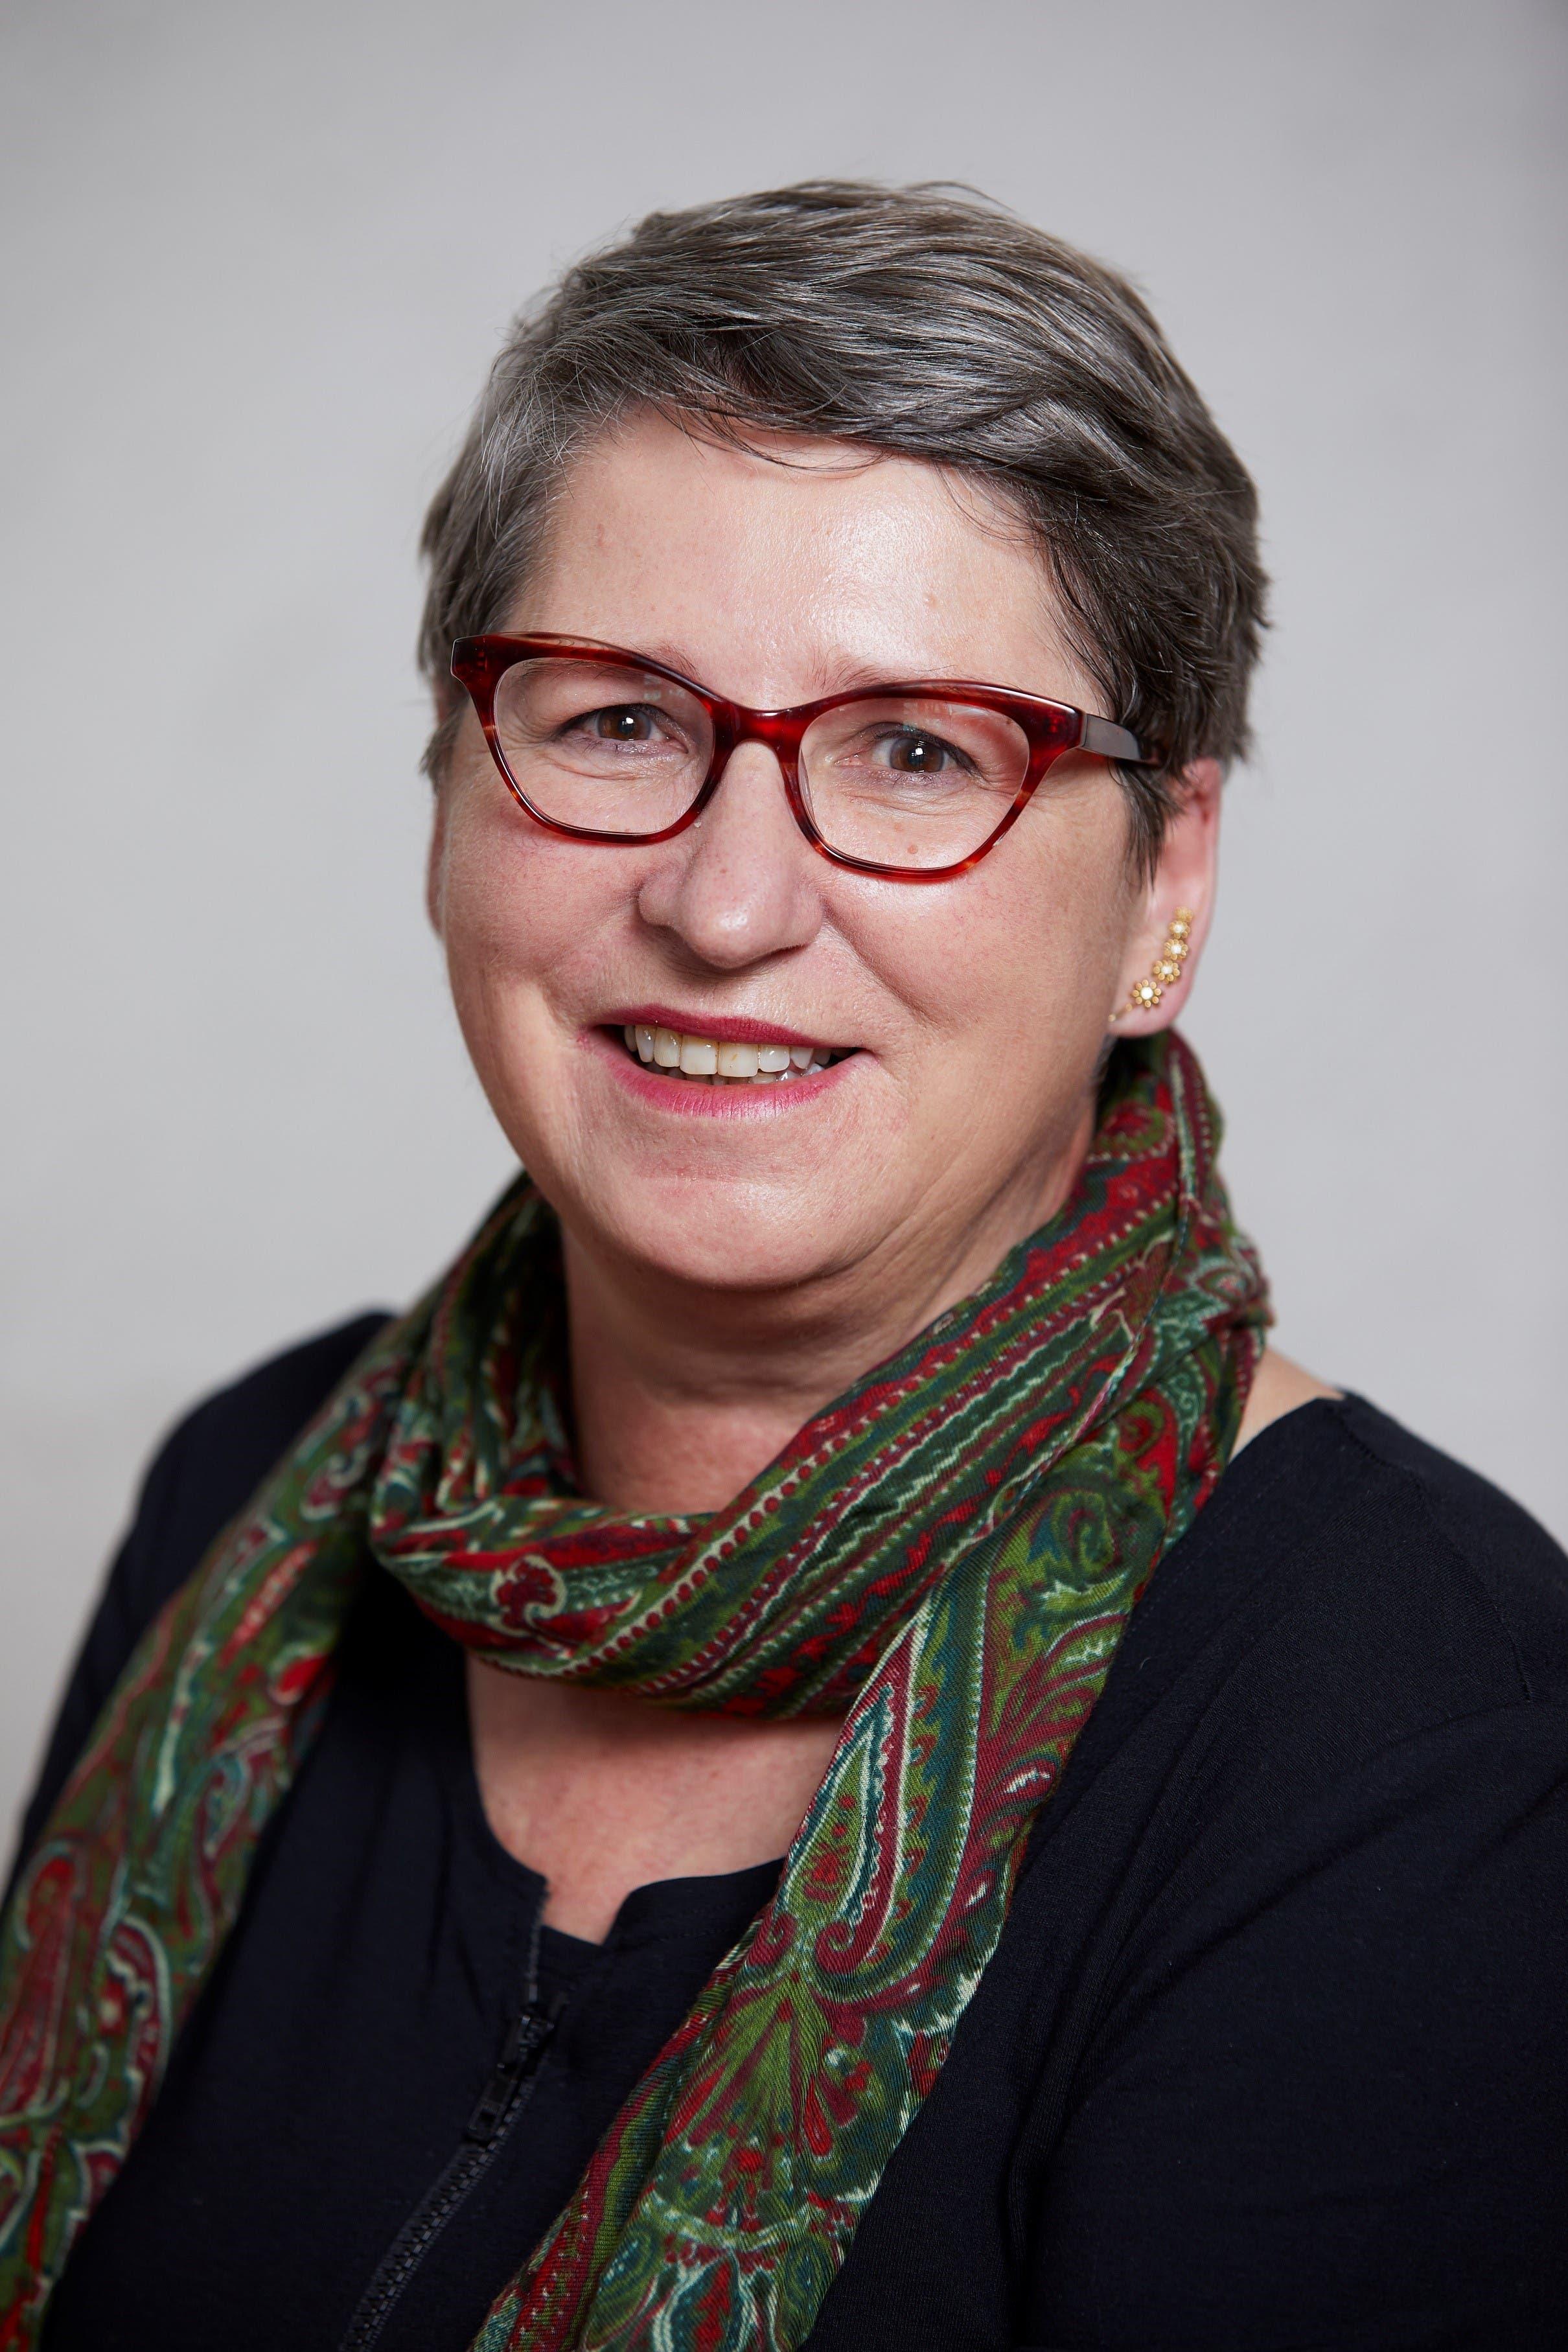 Ursula Stämmer-Horst.